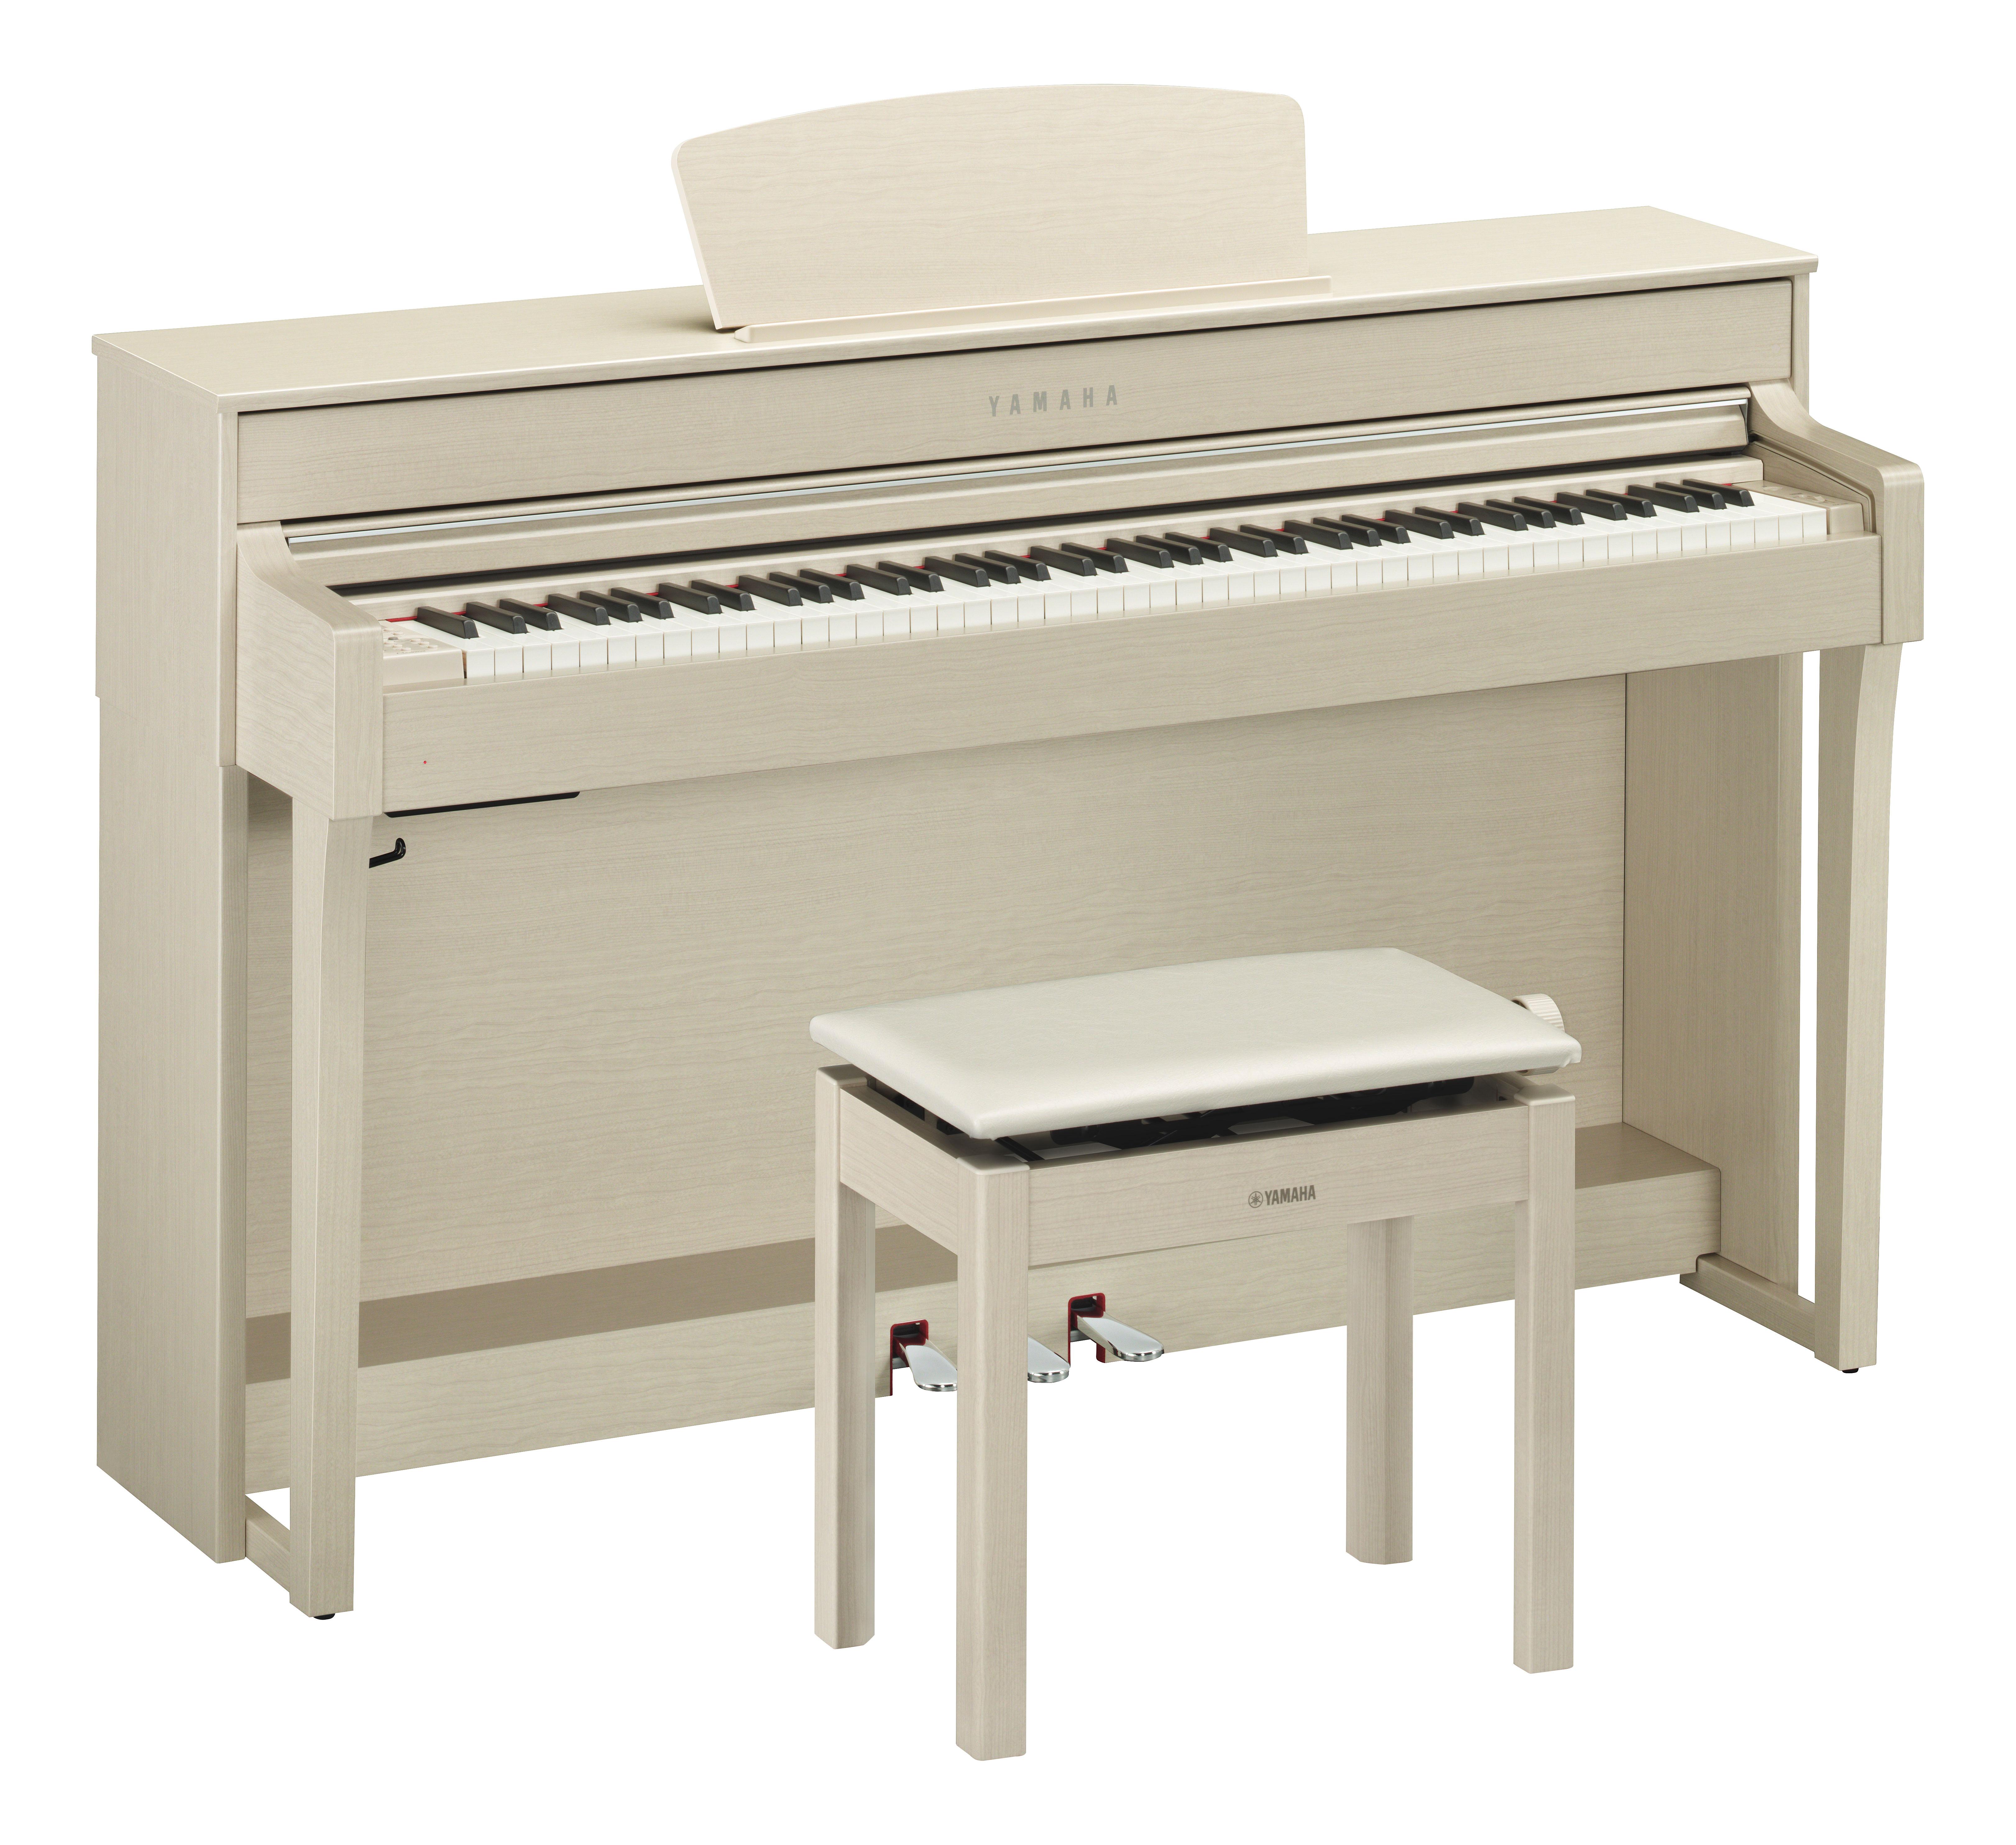 Clp 635 yamaha clp 635 audiofanzine for Yamaha clavinova dealers